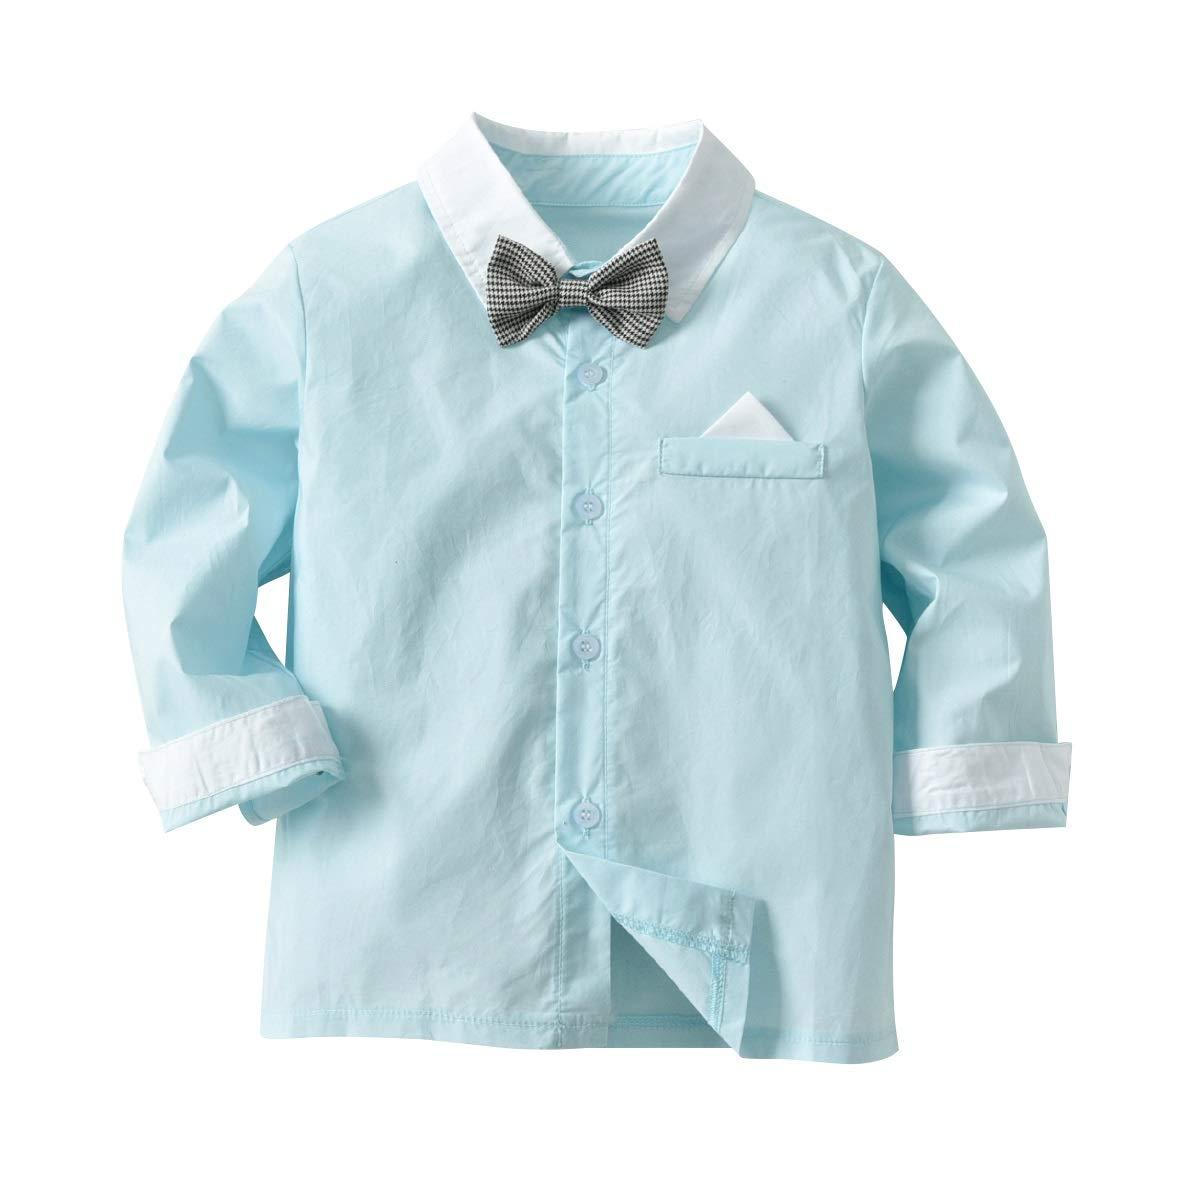 Color : Pink, Size : 4-5Y 2-6Y Boys Gentleman Suit Long Sleeve Bow Tie Shirt+Suspender Pants Clothes Set